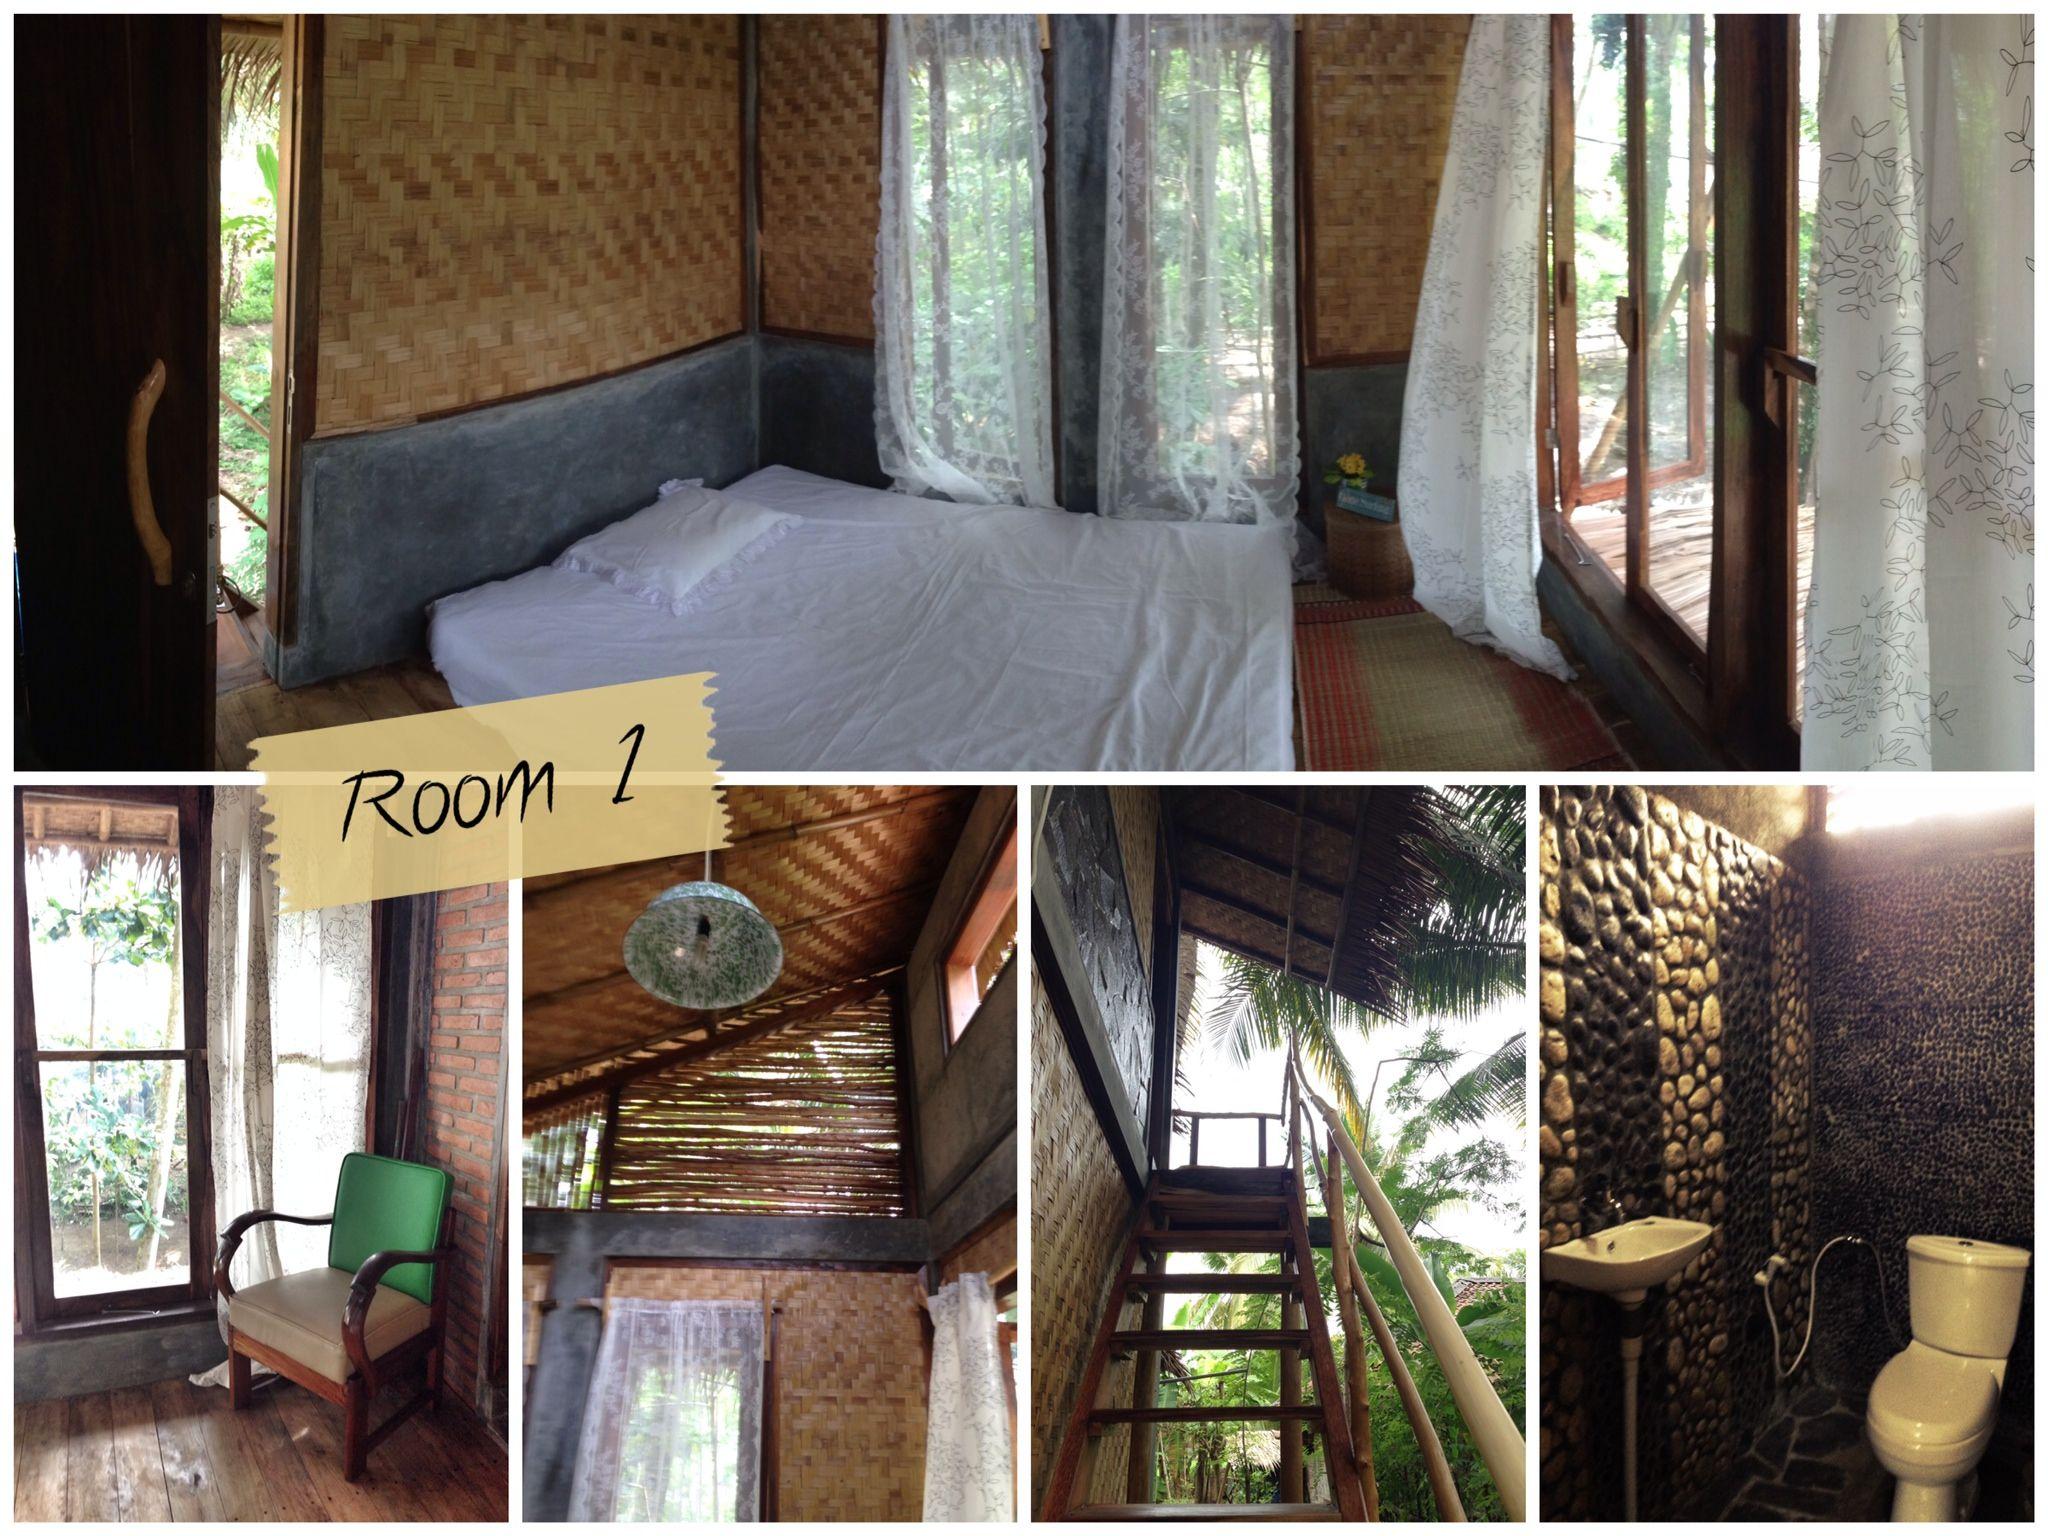 Double Queen Size Bed Room With Private Bathroom At Rumah Raia Pantai Batukaras Cijulang West Java Indonesia House Pantai